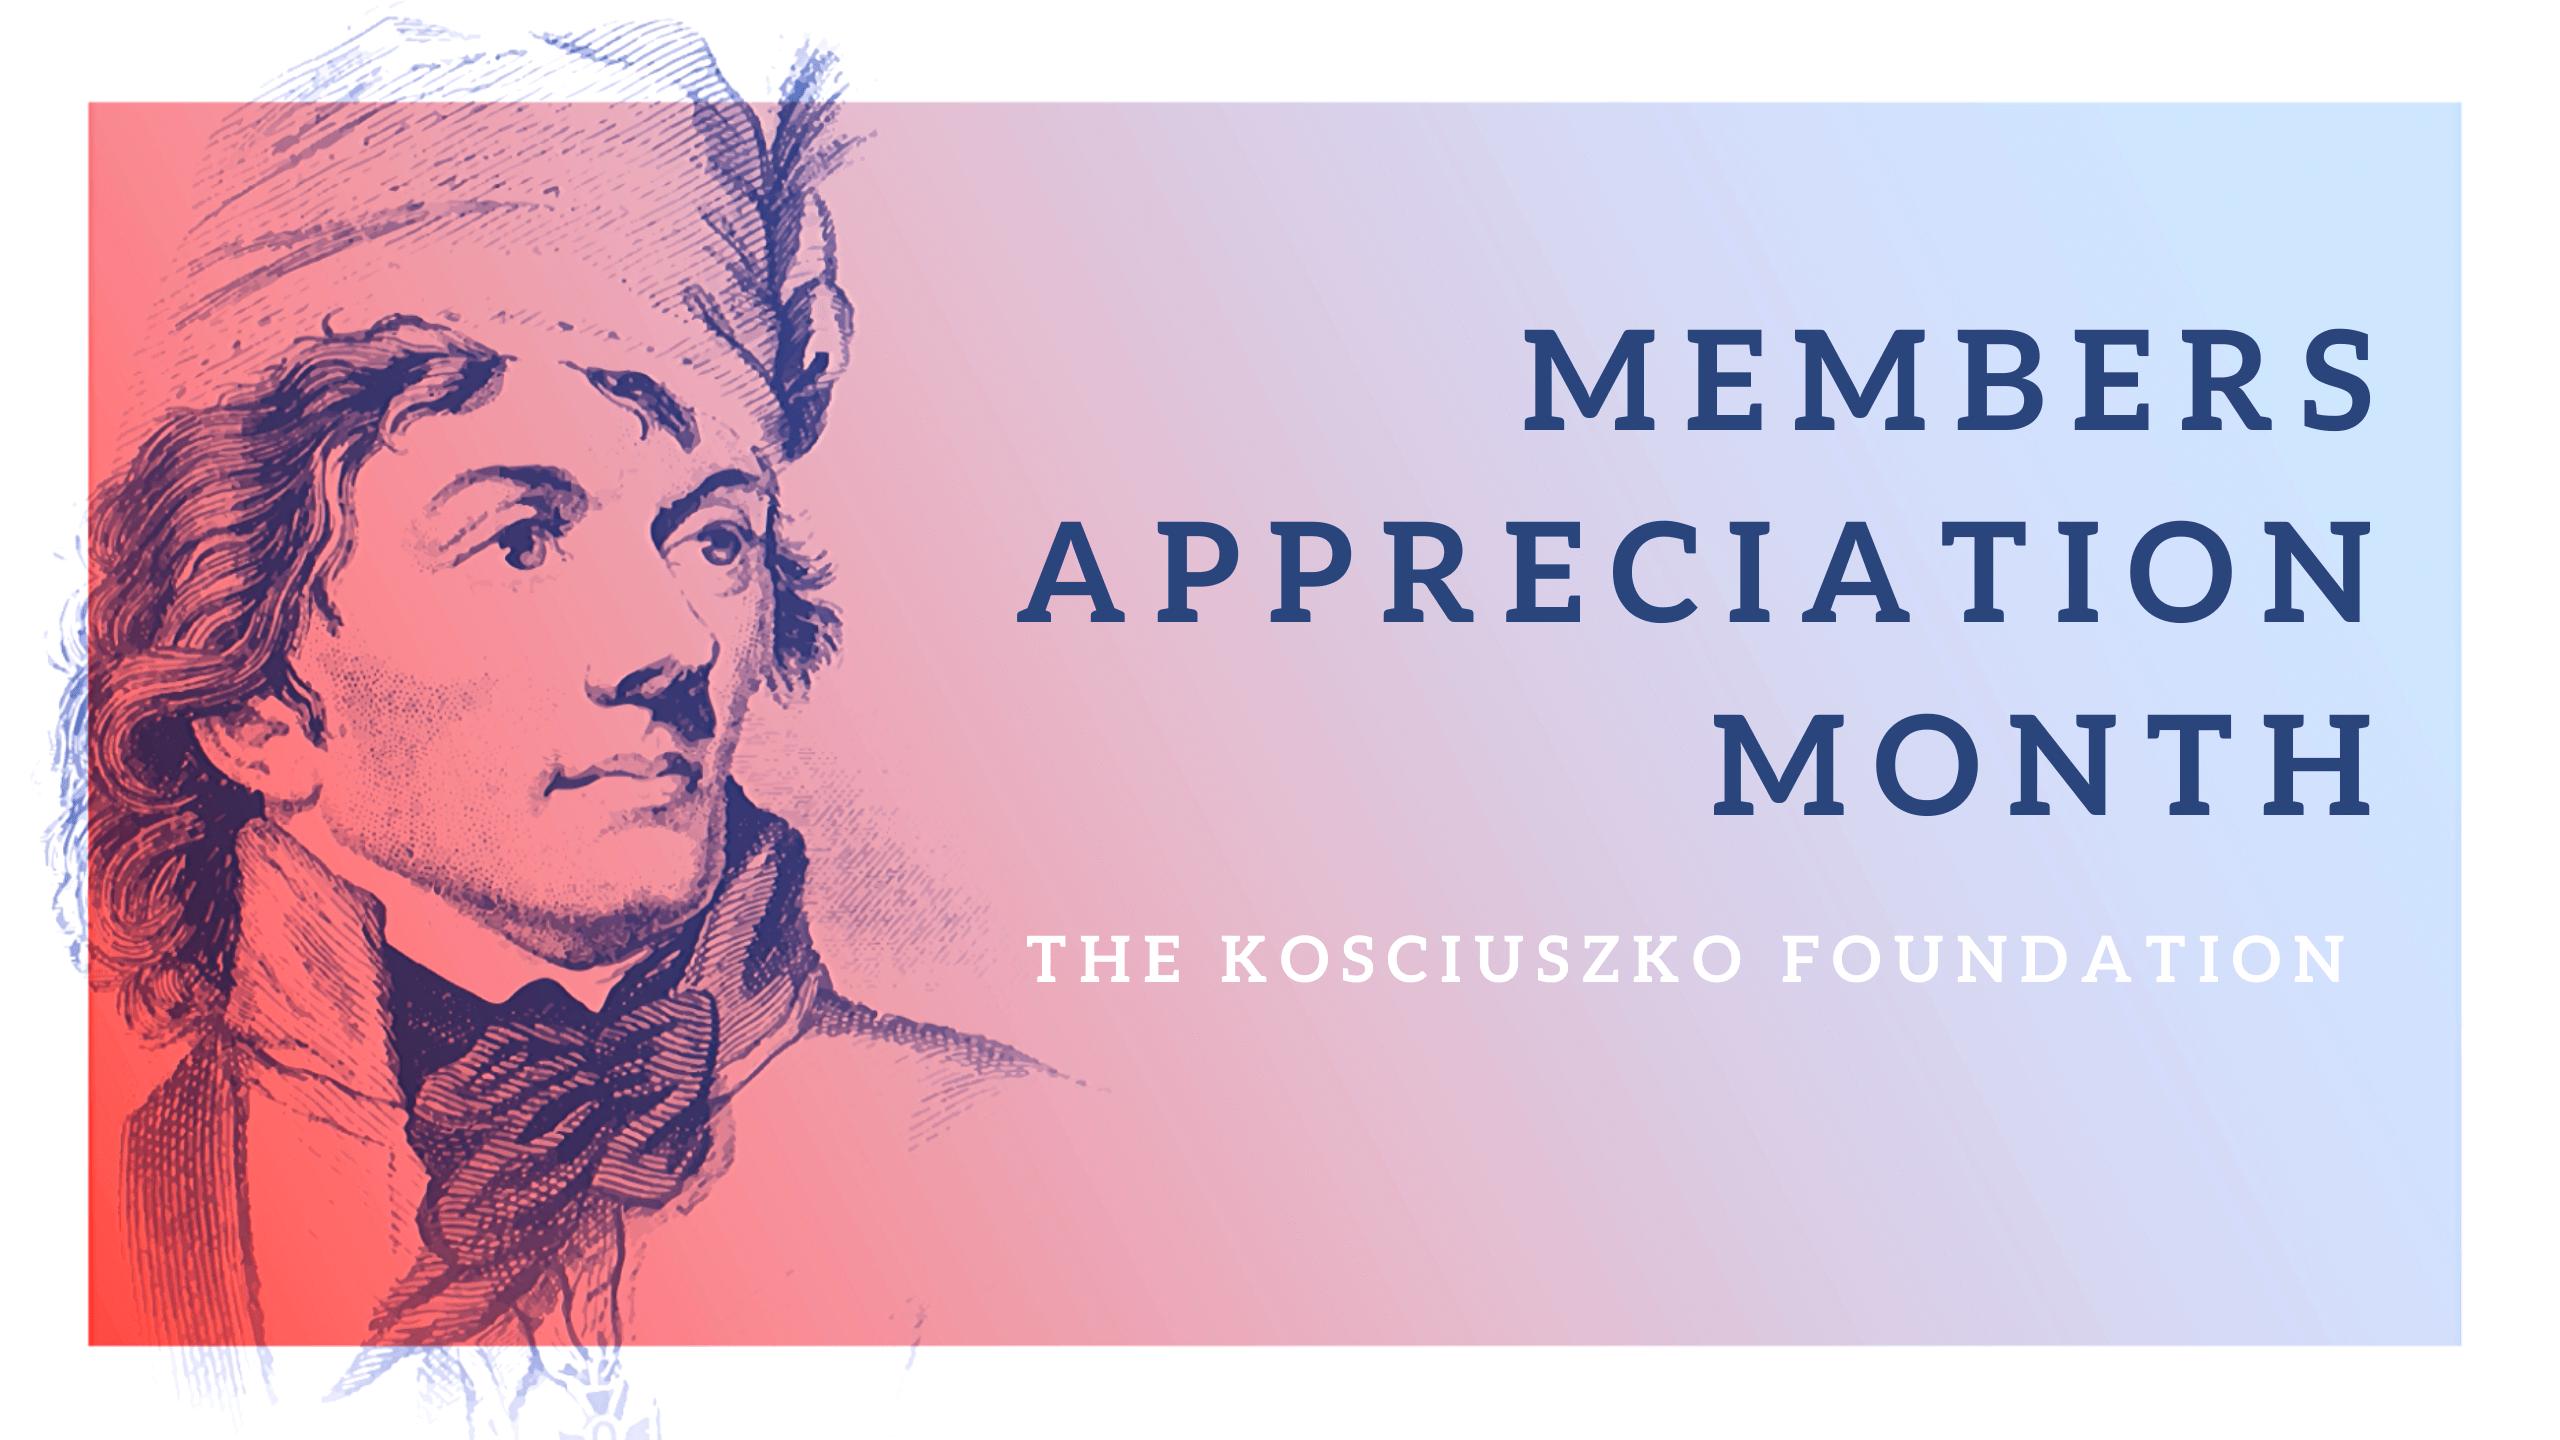 The Kosciuszko Foundation in New York: Members Appreciation Month